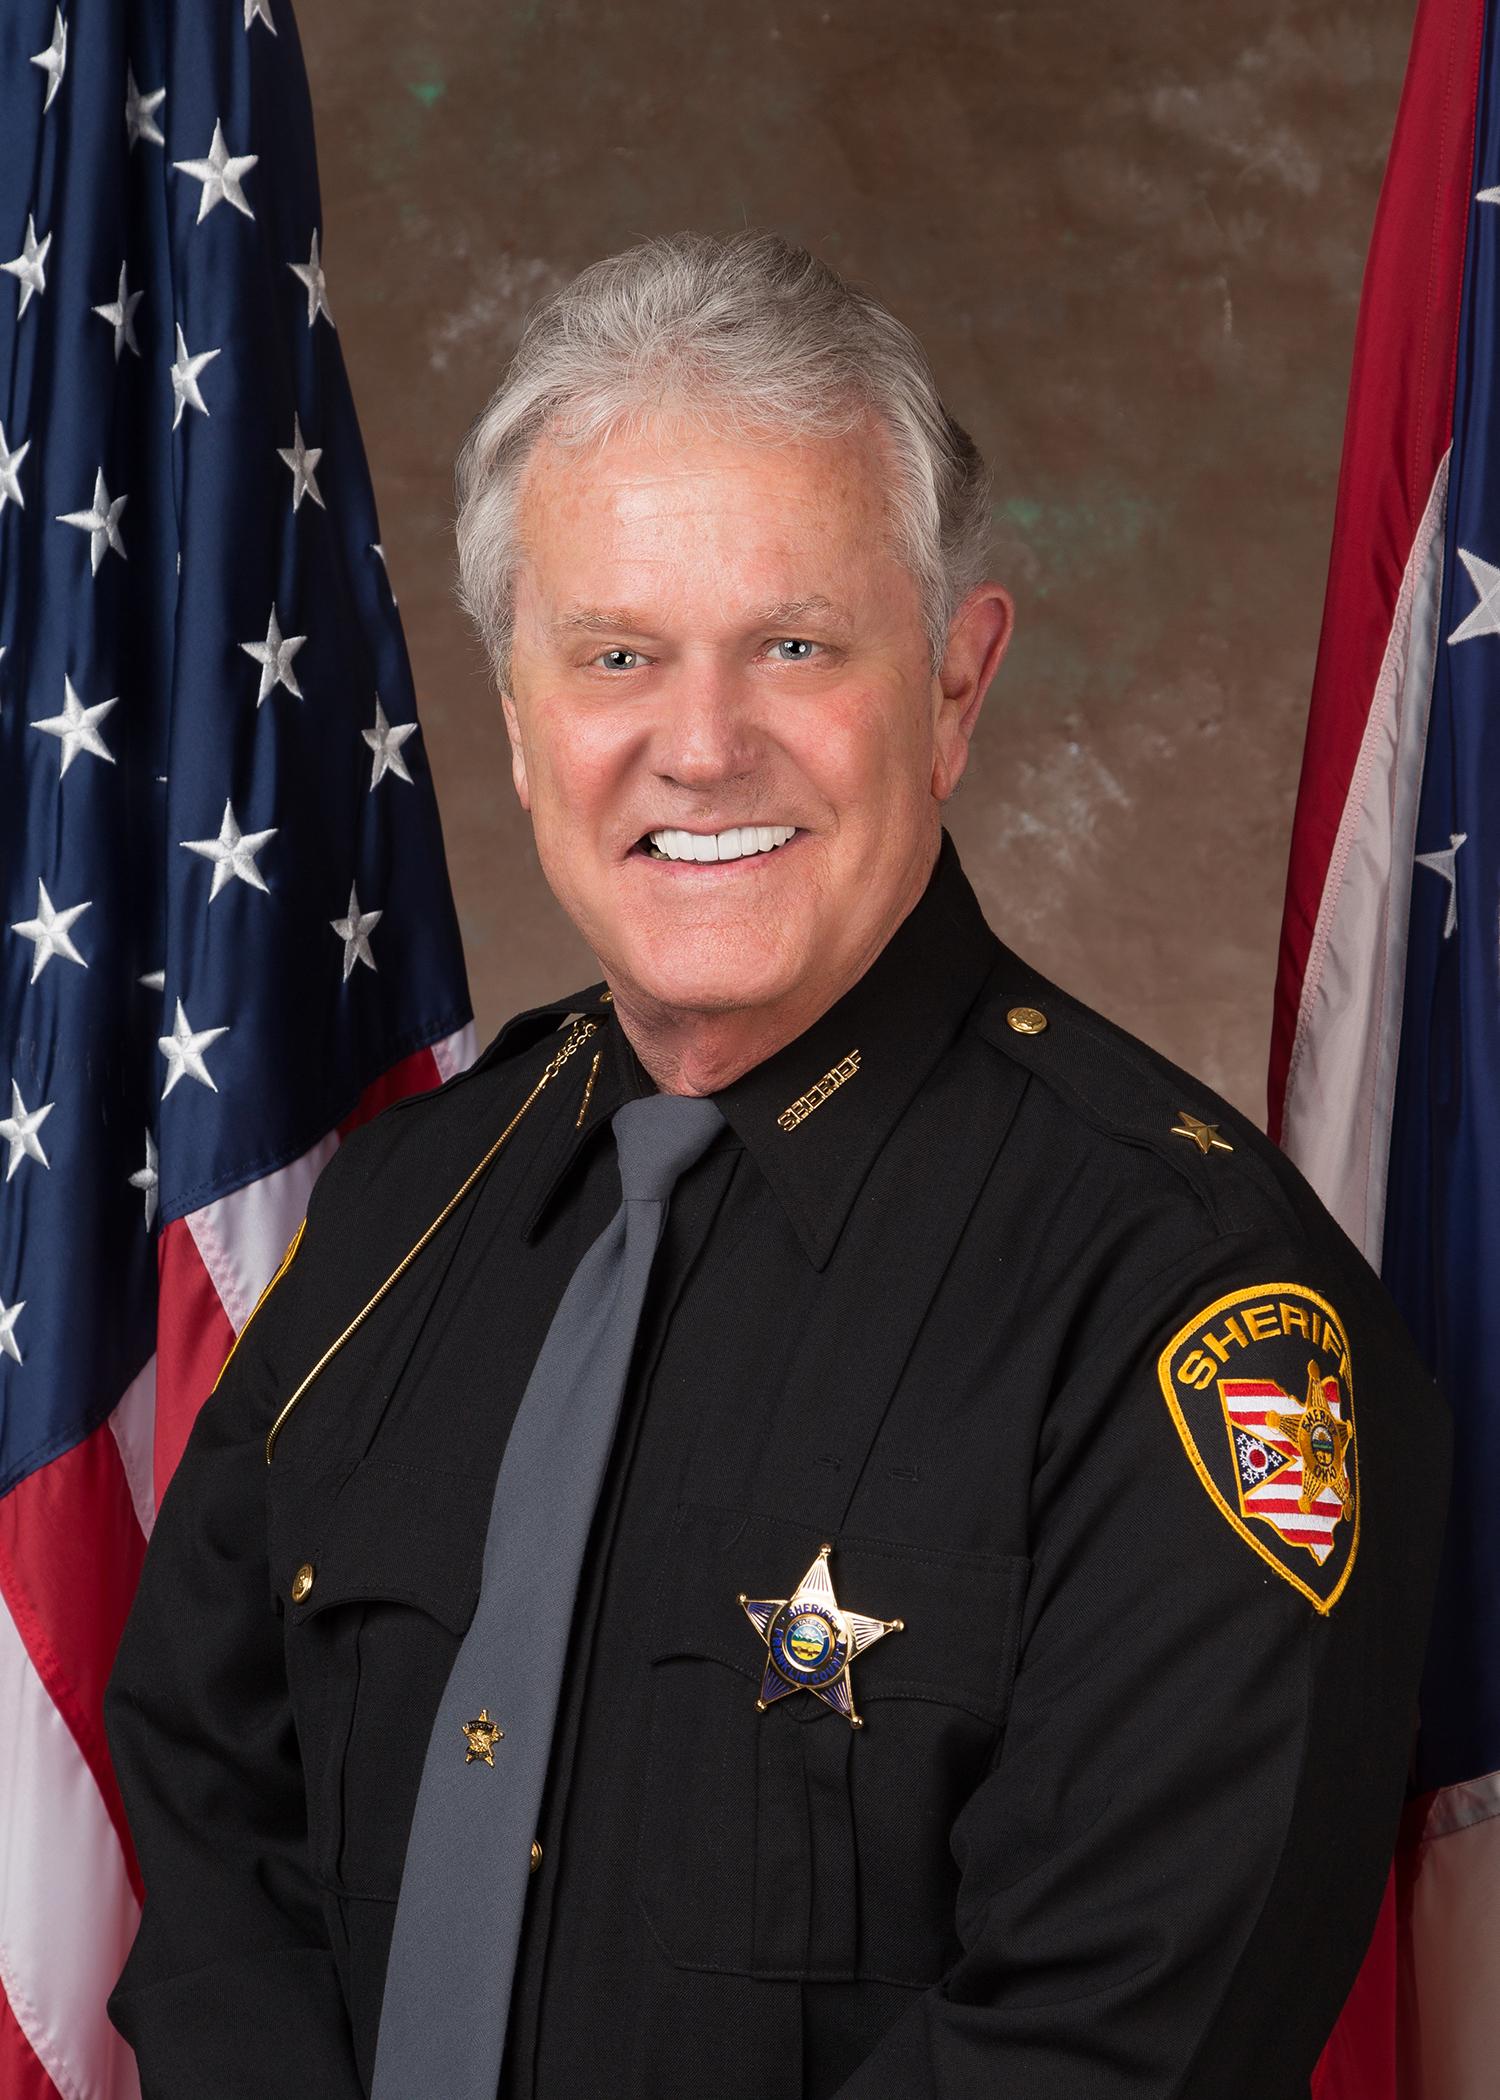 Lucas Ohio | Buckeye State Sheriffs' Association